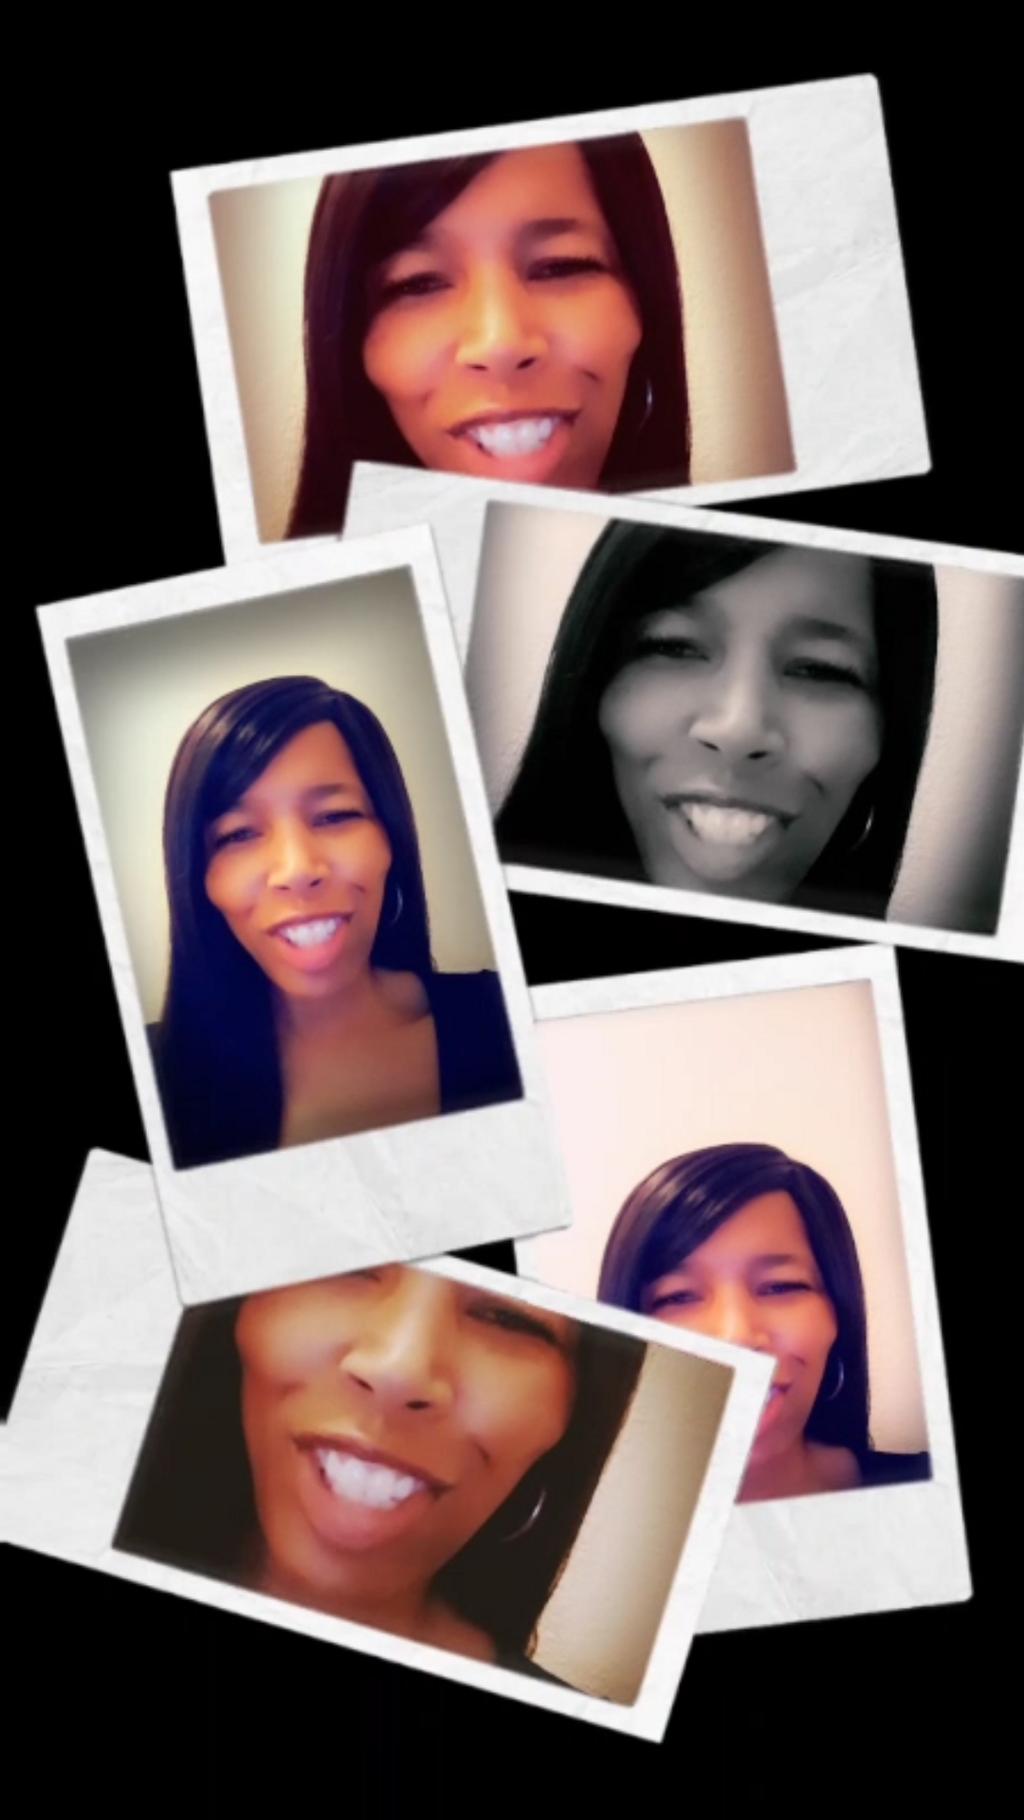 #drdonnathomasrodgers #turnarounddoctor #turnaroundeffect #turnaroundrisk #turnaroundtip #appsmash #appcollab #facetography #selftography #photogrid #picsart #snapchatlenses